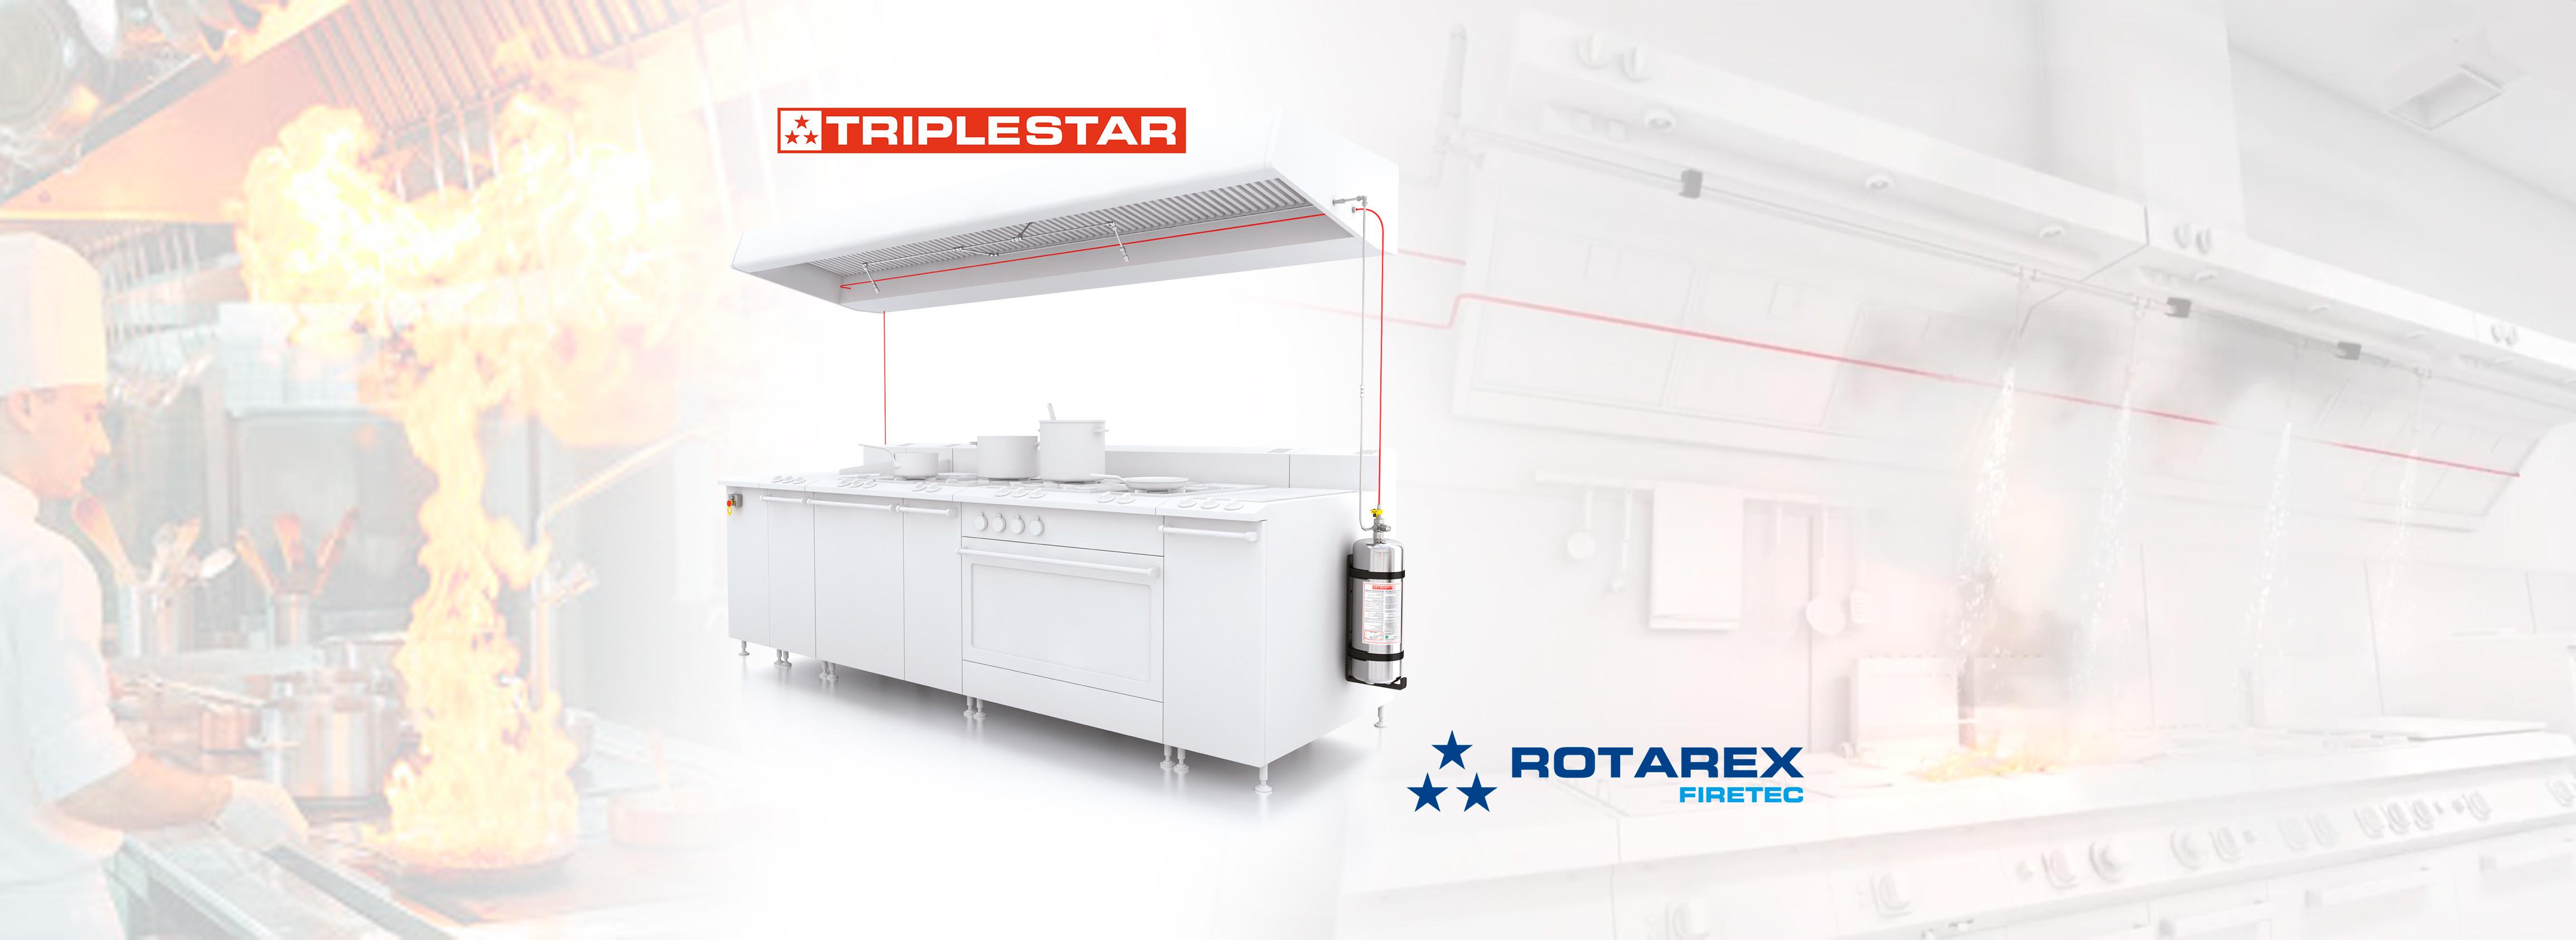 TRIPLESTAR - ROTAREX